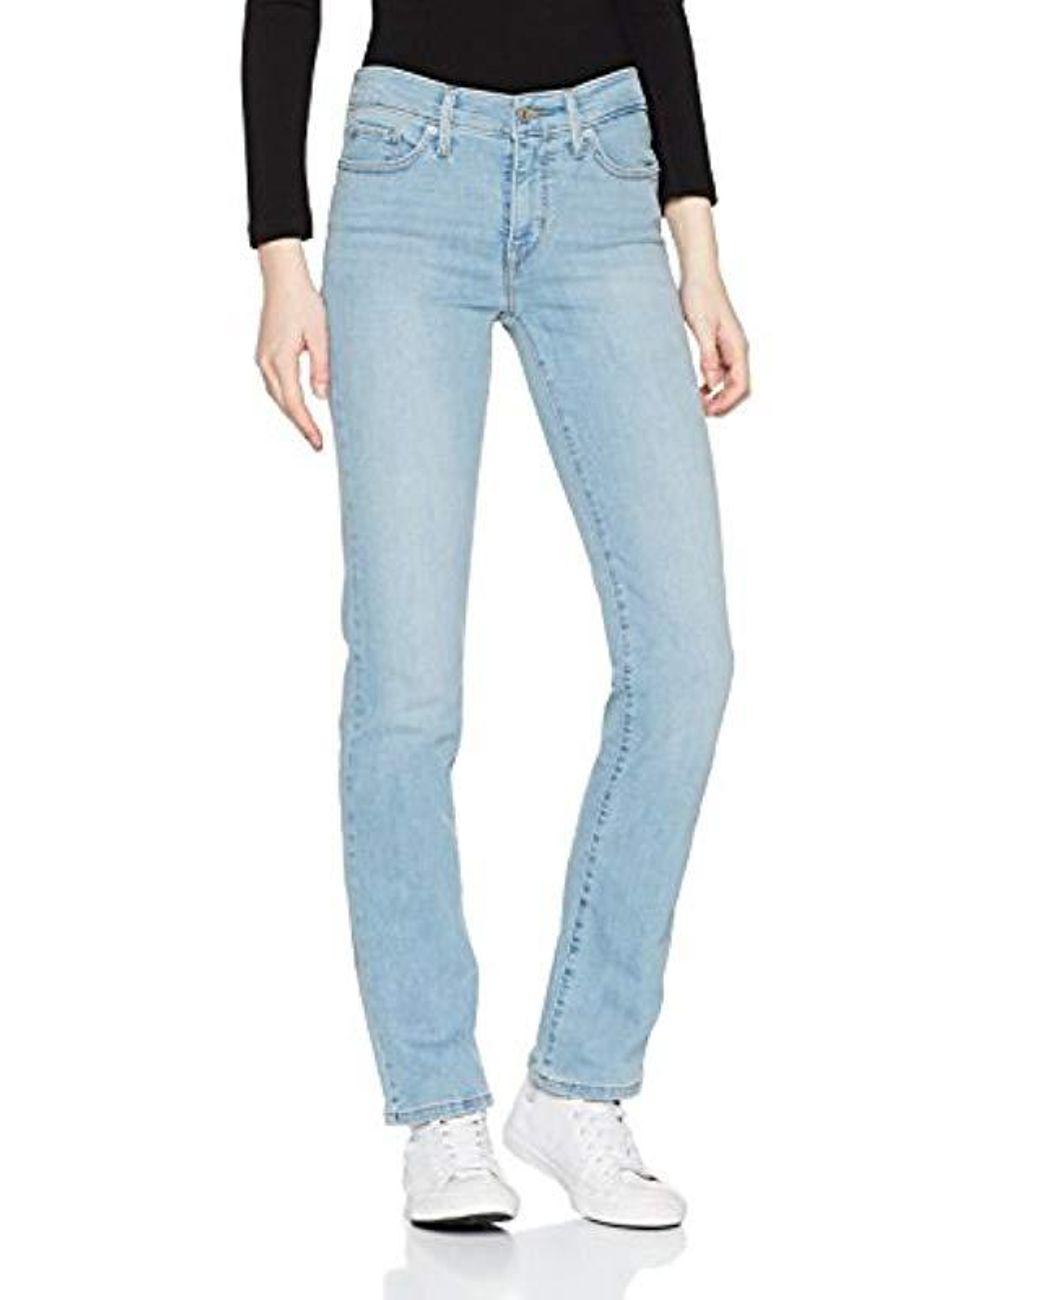 free shipping c1d14 863dd Damen Jeans 314 Straight Fit in blau